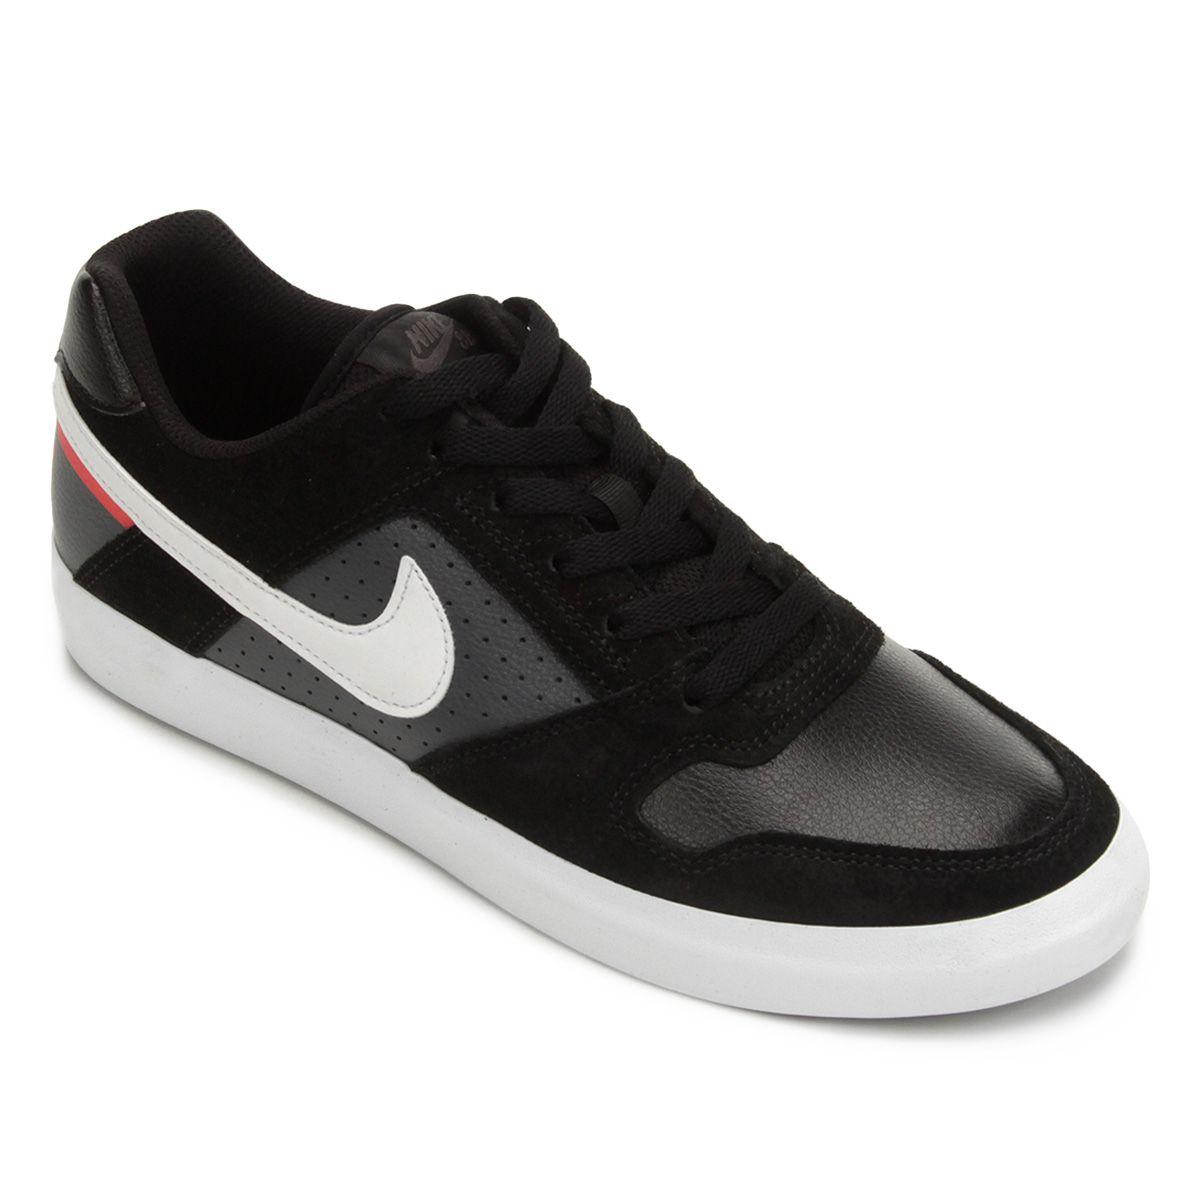 Tenis Nike Delta Zoom - 942237-011